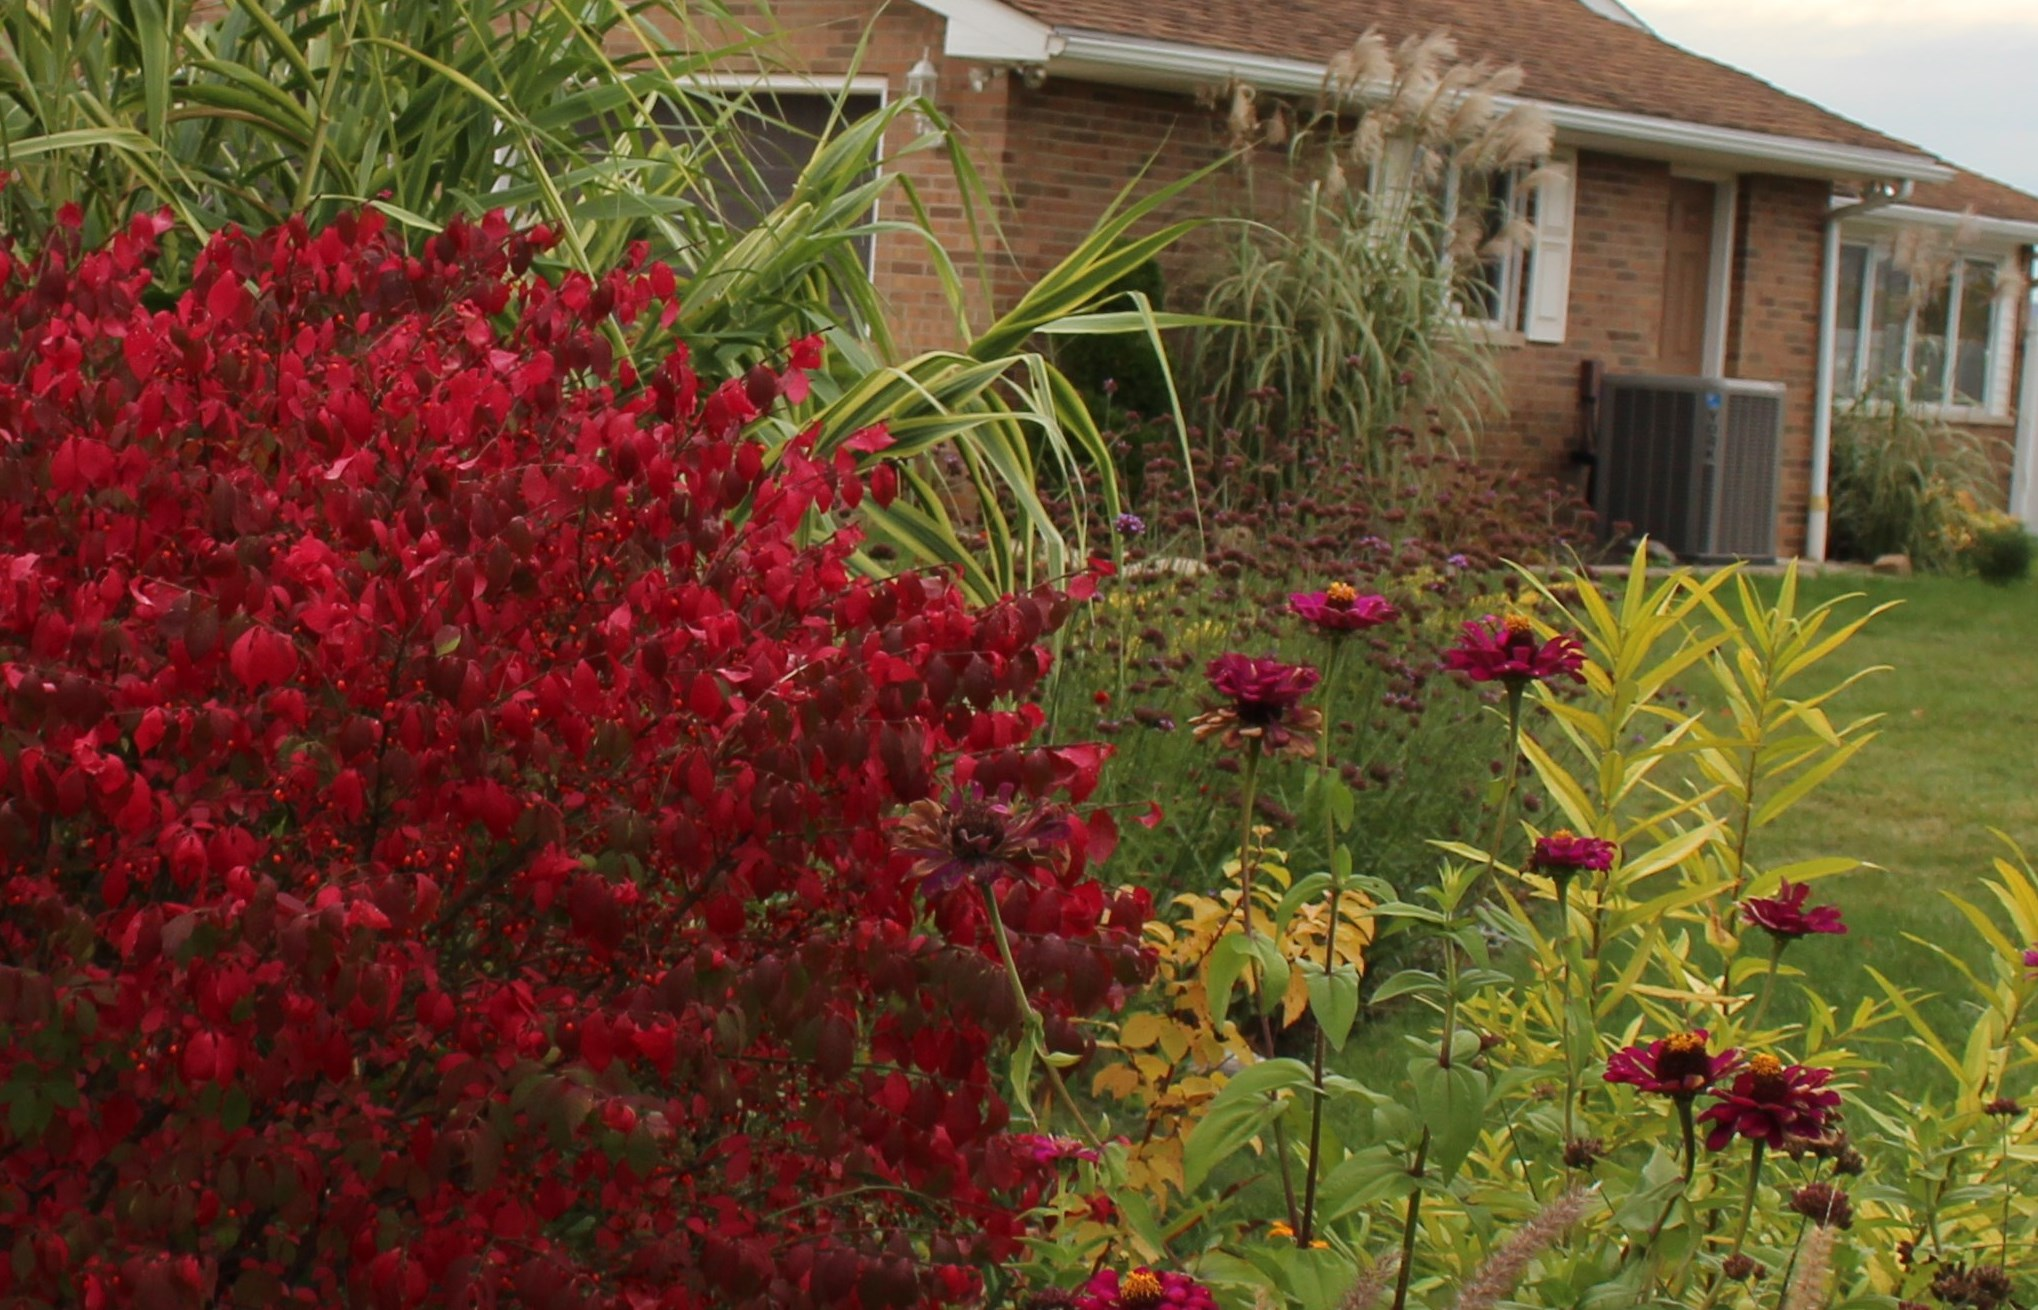 GB Foliage Day- October Highlights « sorta like suburbia